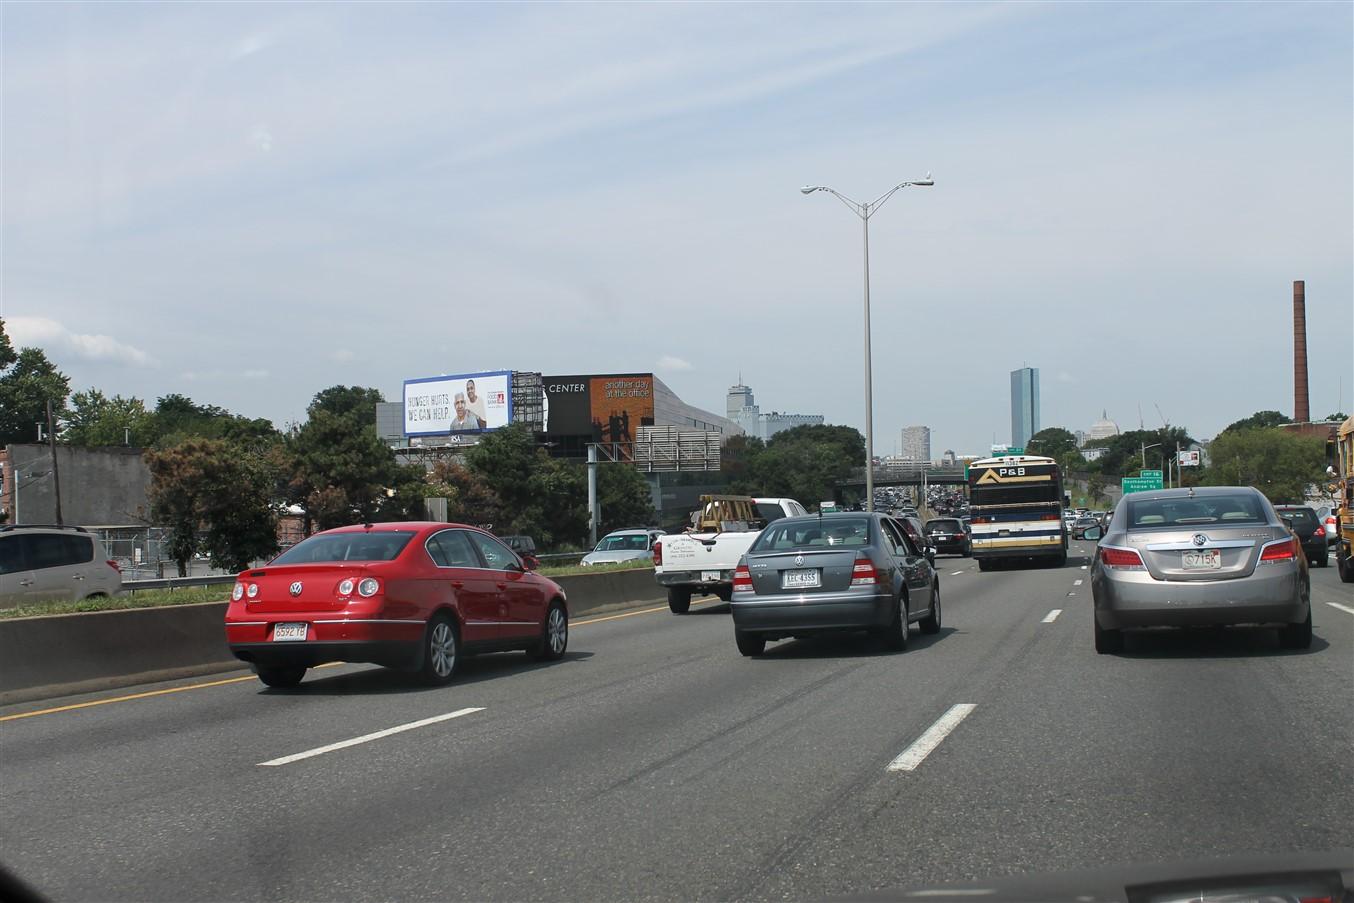 2012 08 25 3 Boston.jpg